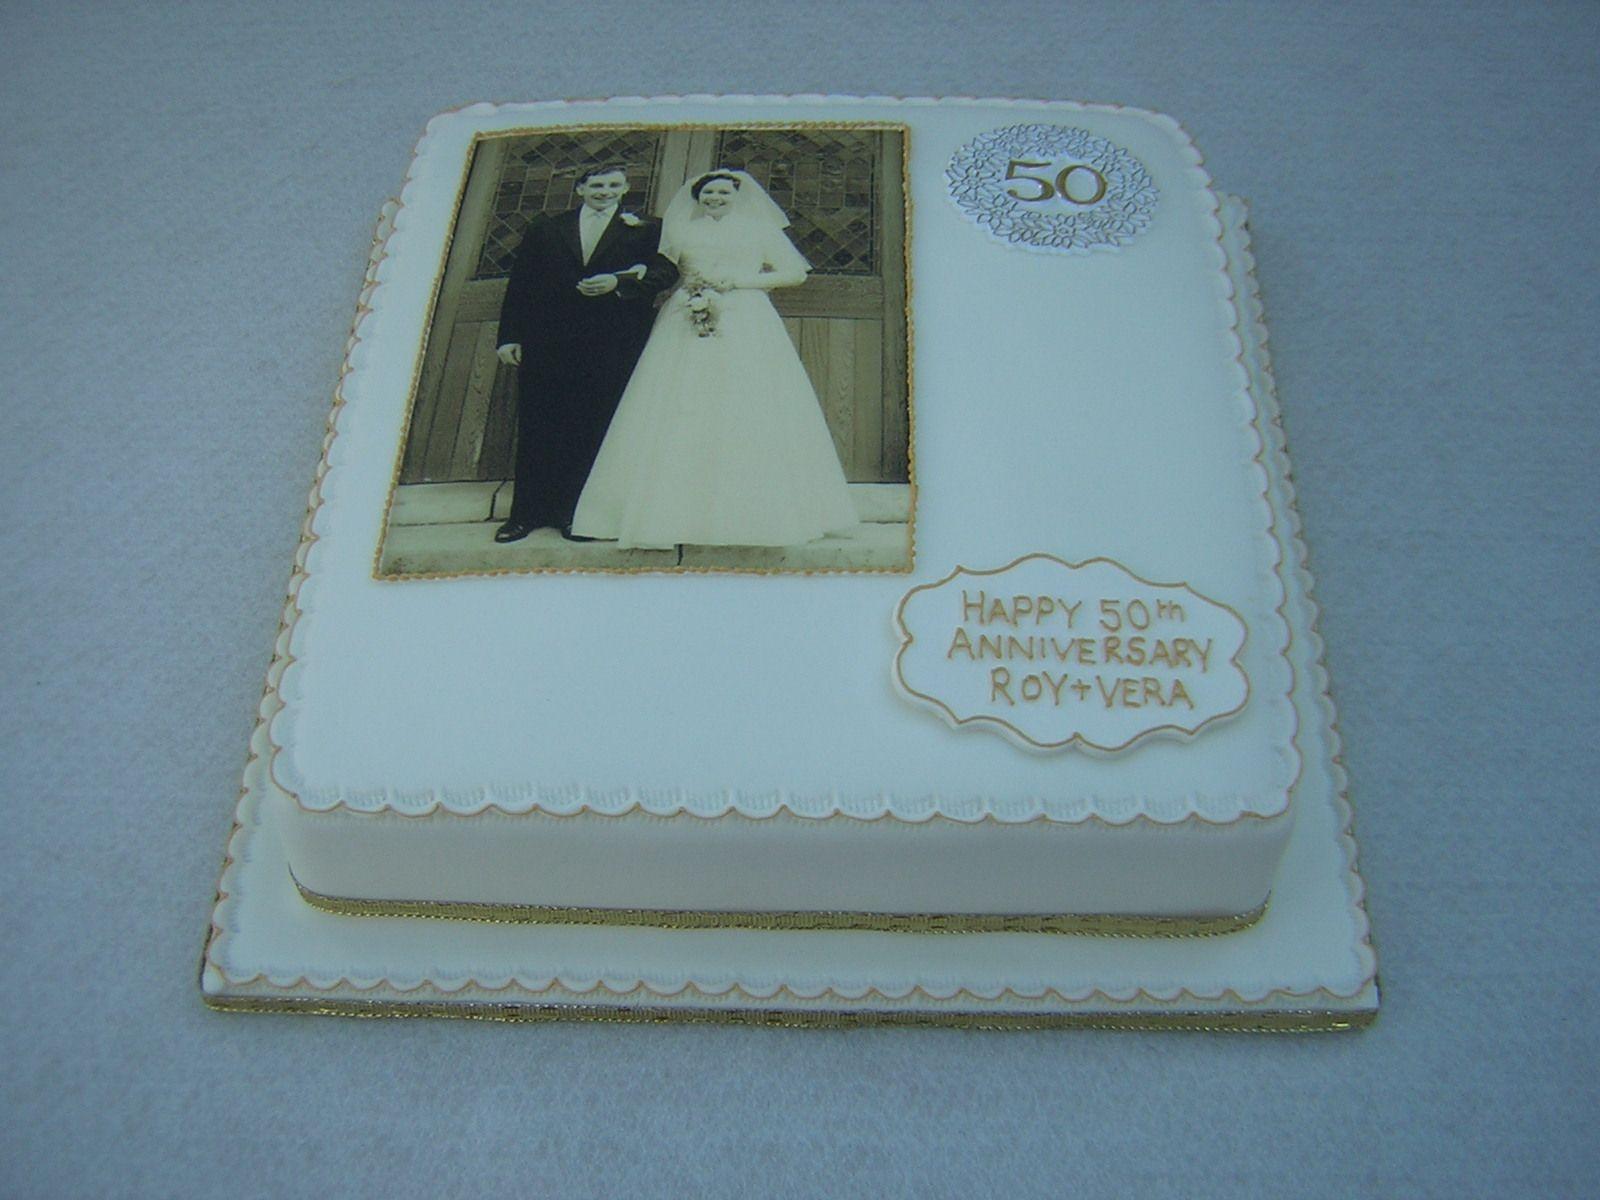 50th Anniversary Cupcake Decorations 50th Anniversary Cakes 50th Wedding Anniversary Cake In White